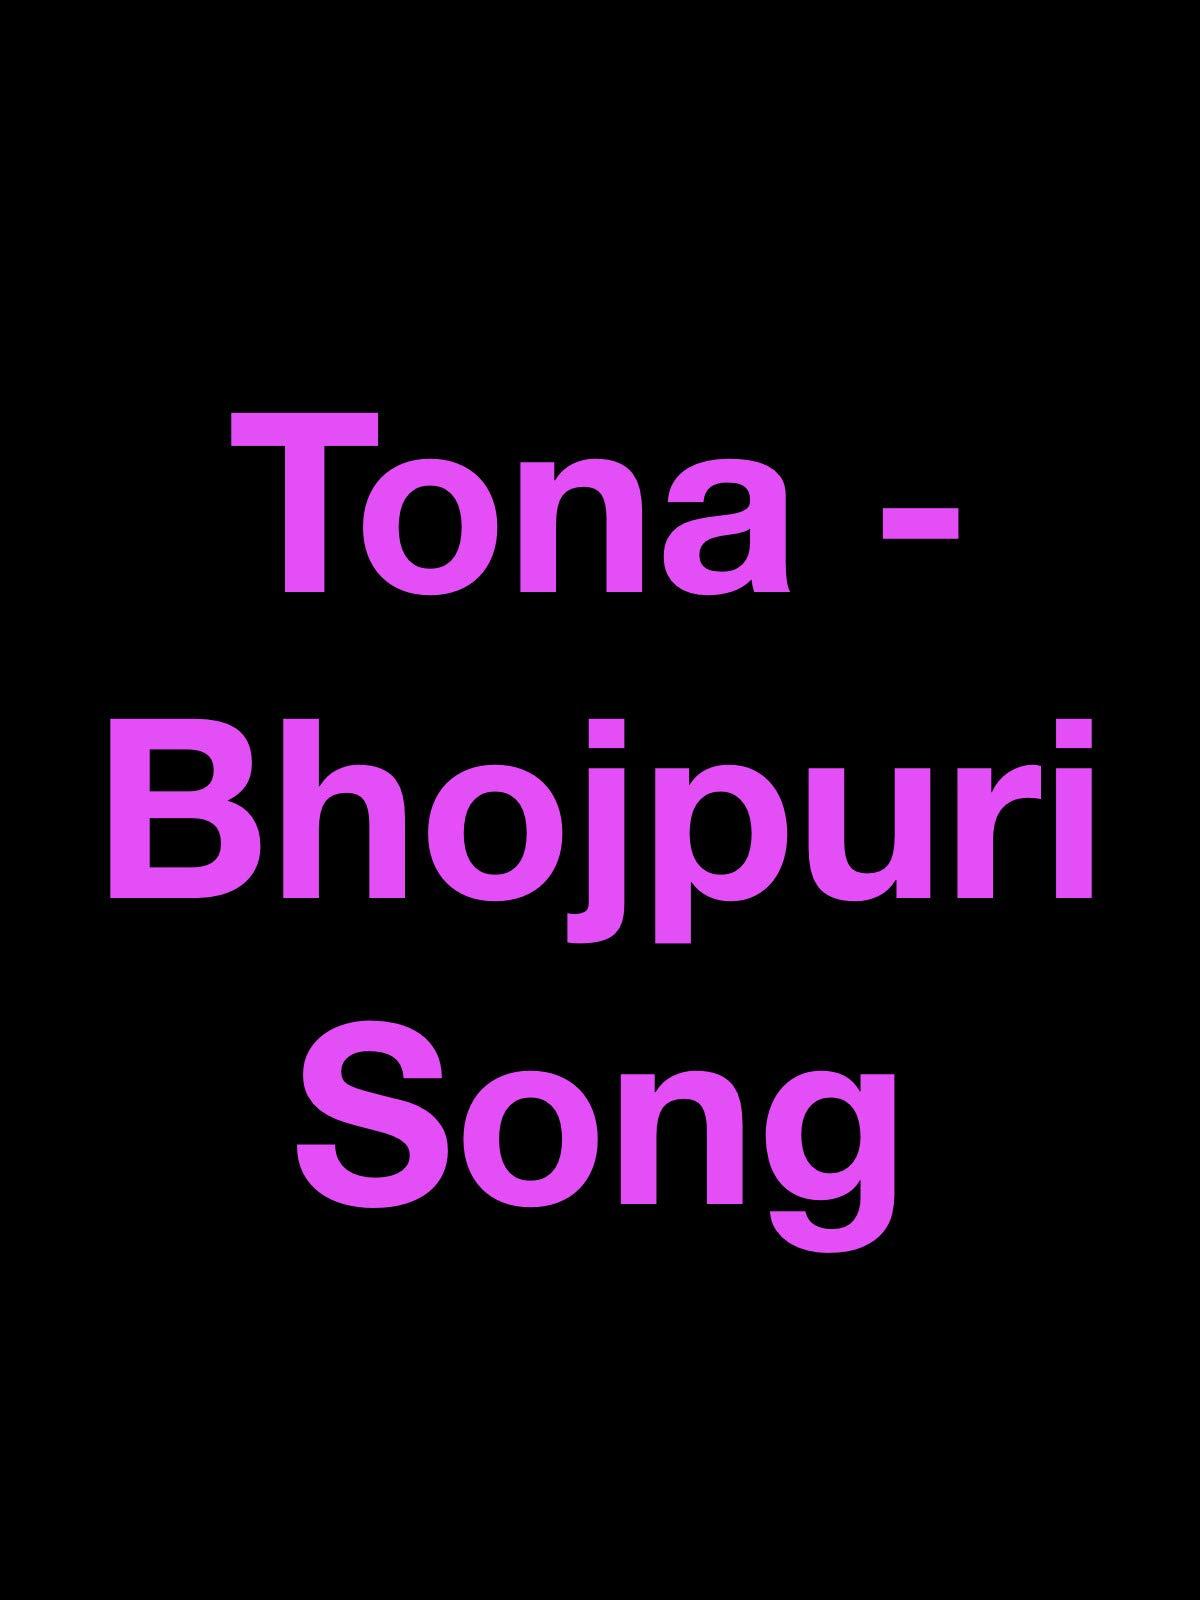 Tona - Bhojpuri Song